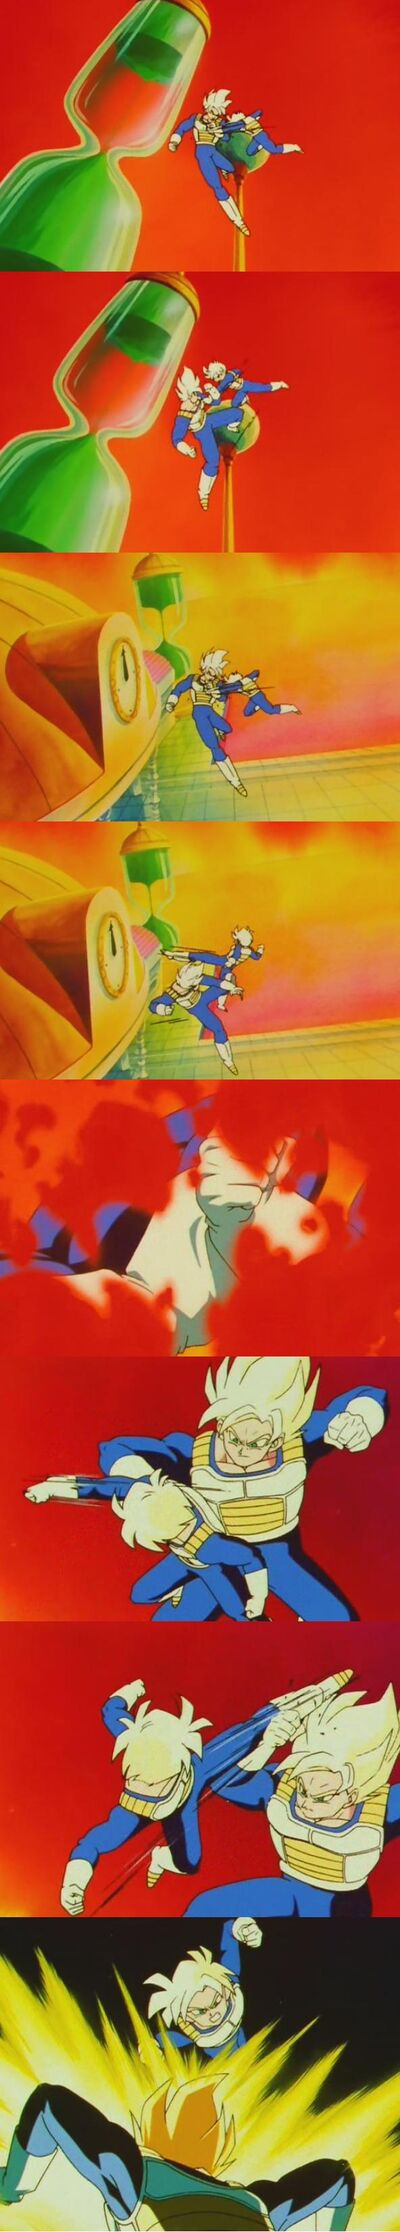 Gohan Teen Super Saiyan super 10